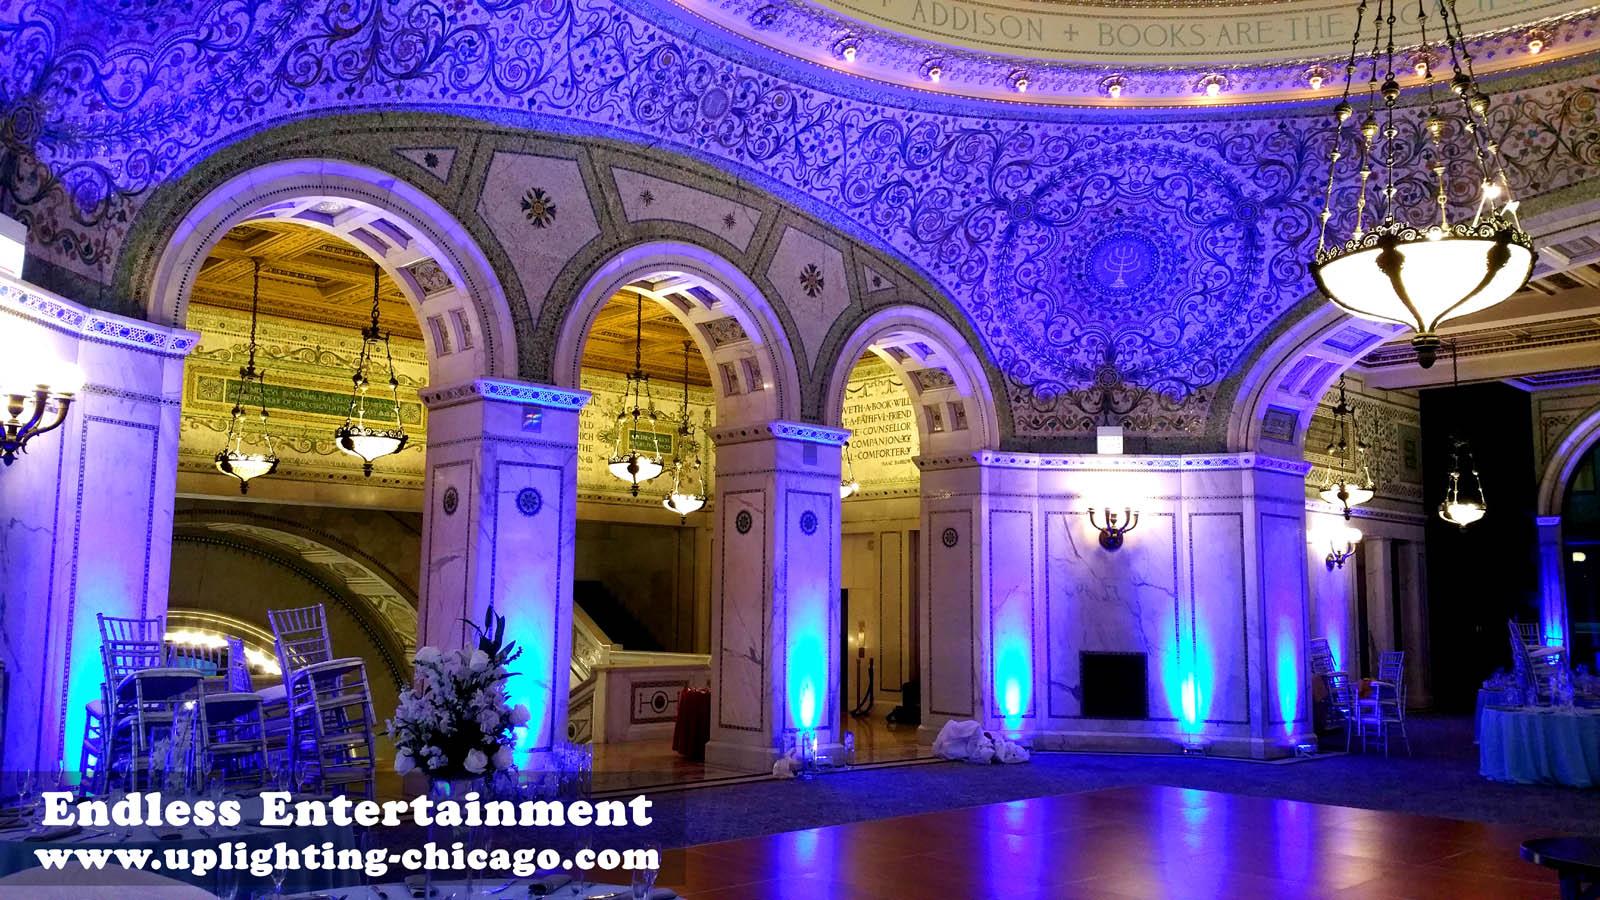 Uplighting Chicago Cultural Center